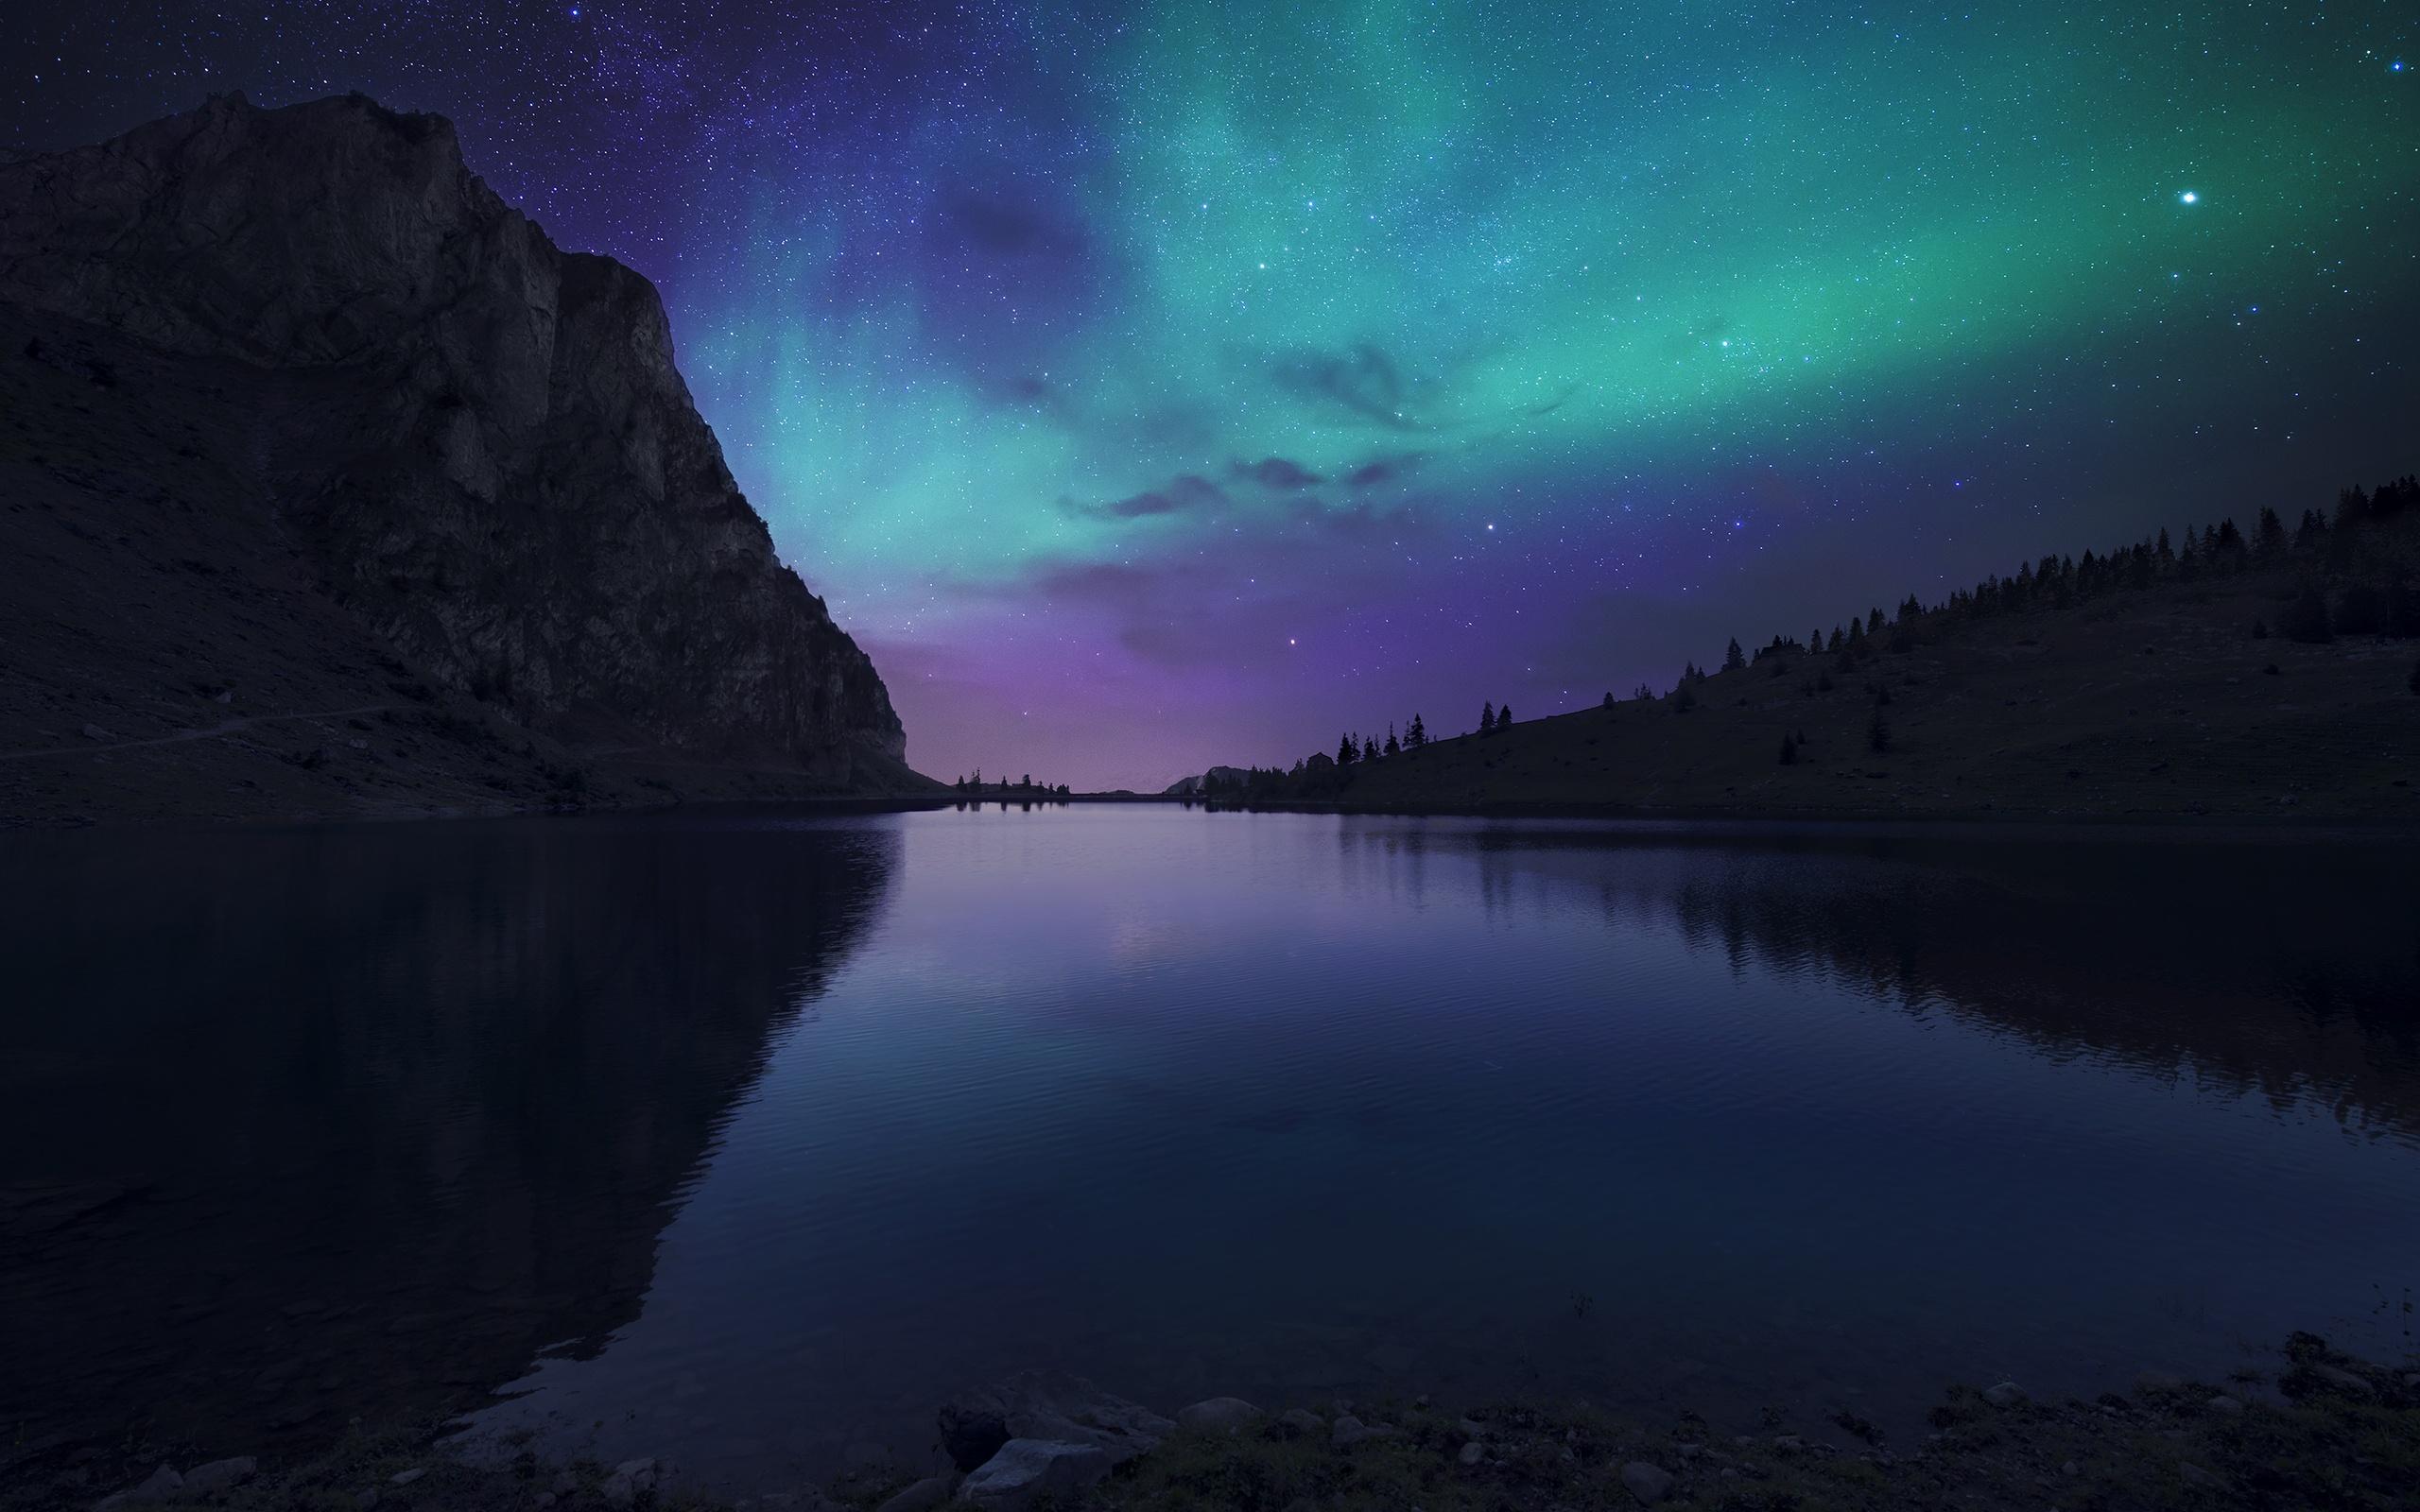 Download wallpaper x northern lights aurora borealis uk